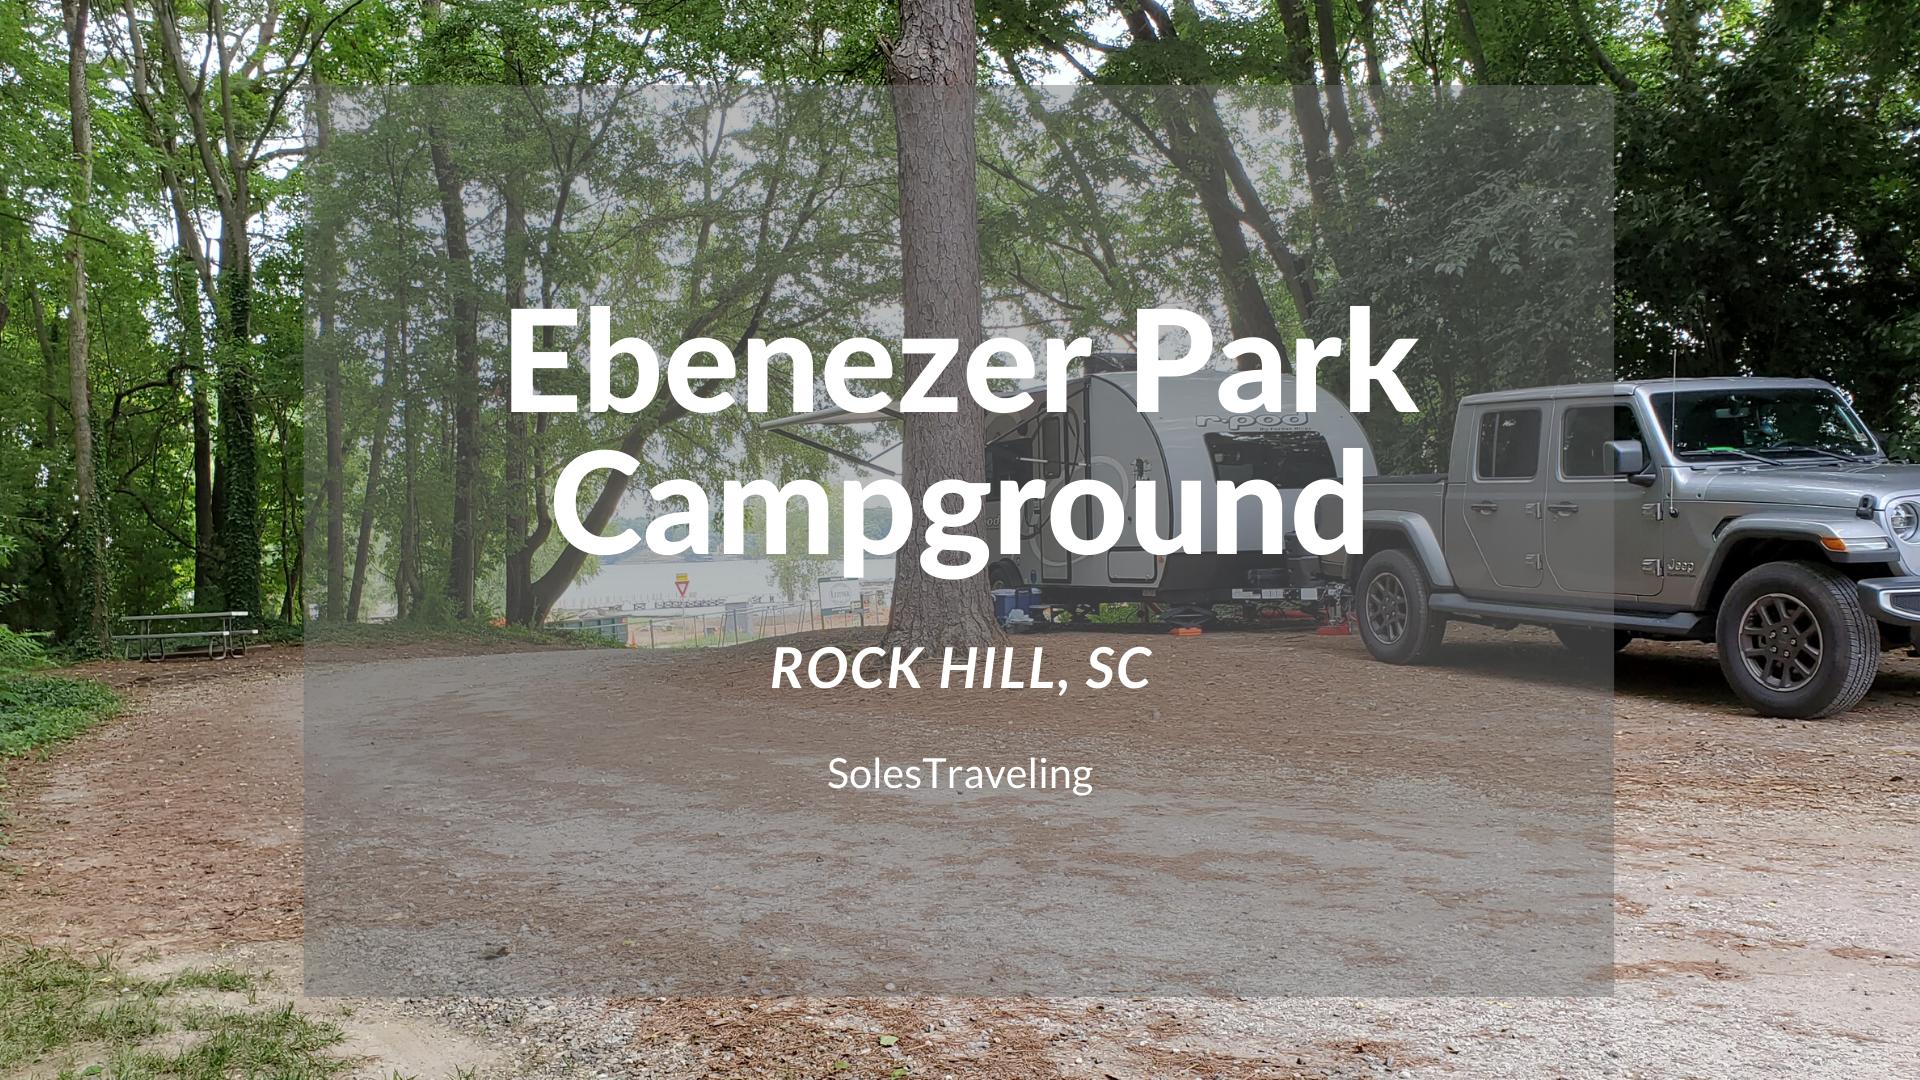 Ebenezer Park Campground